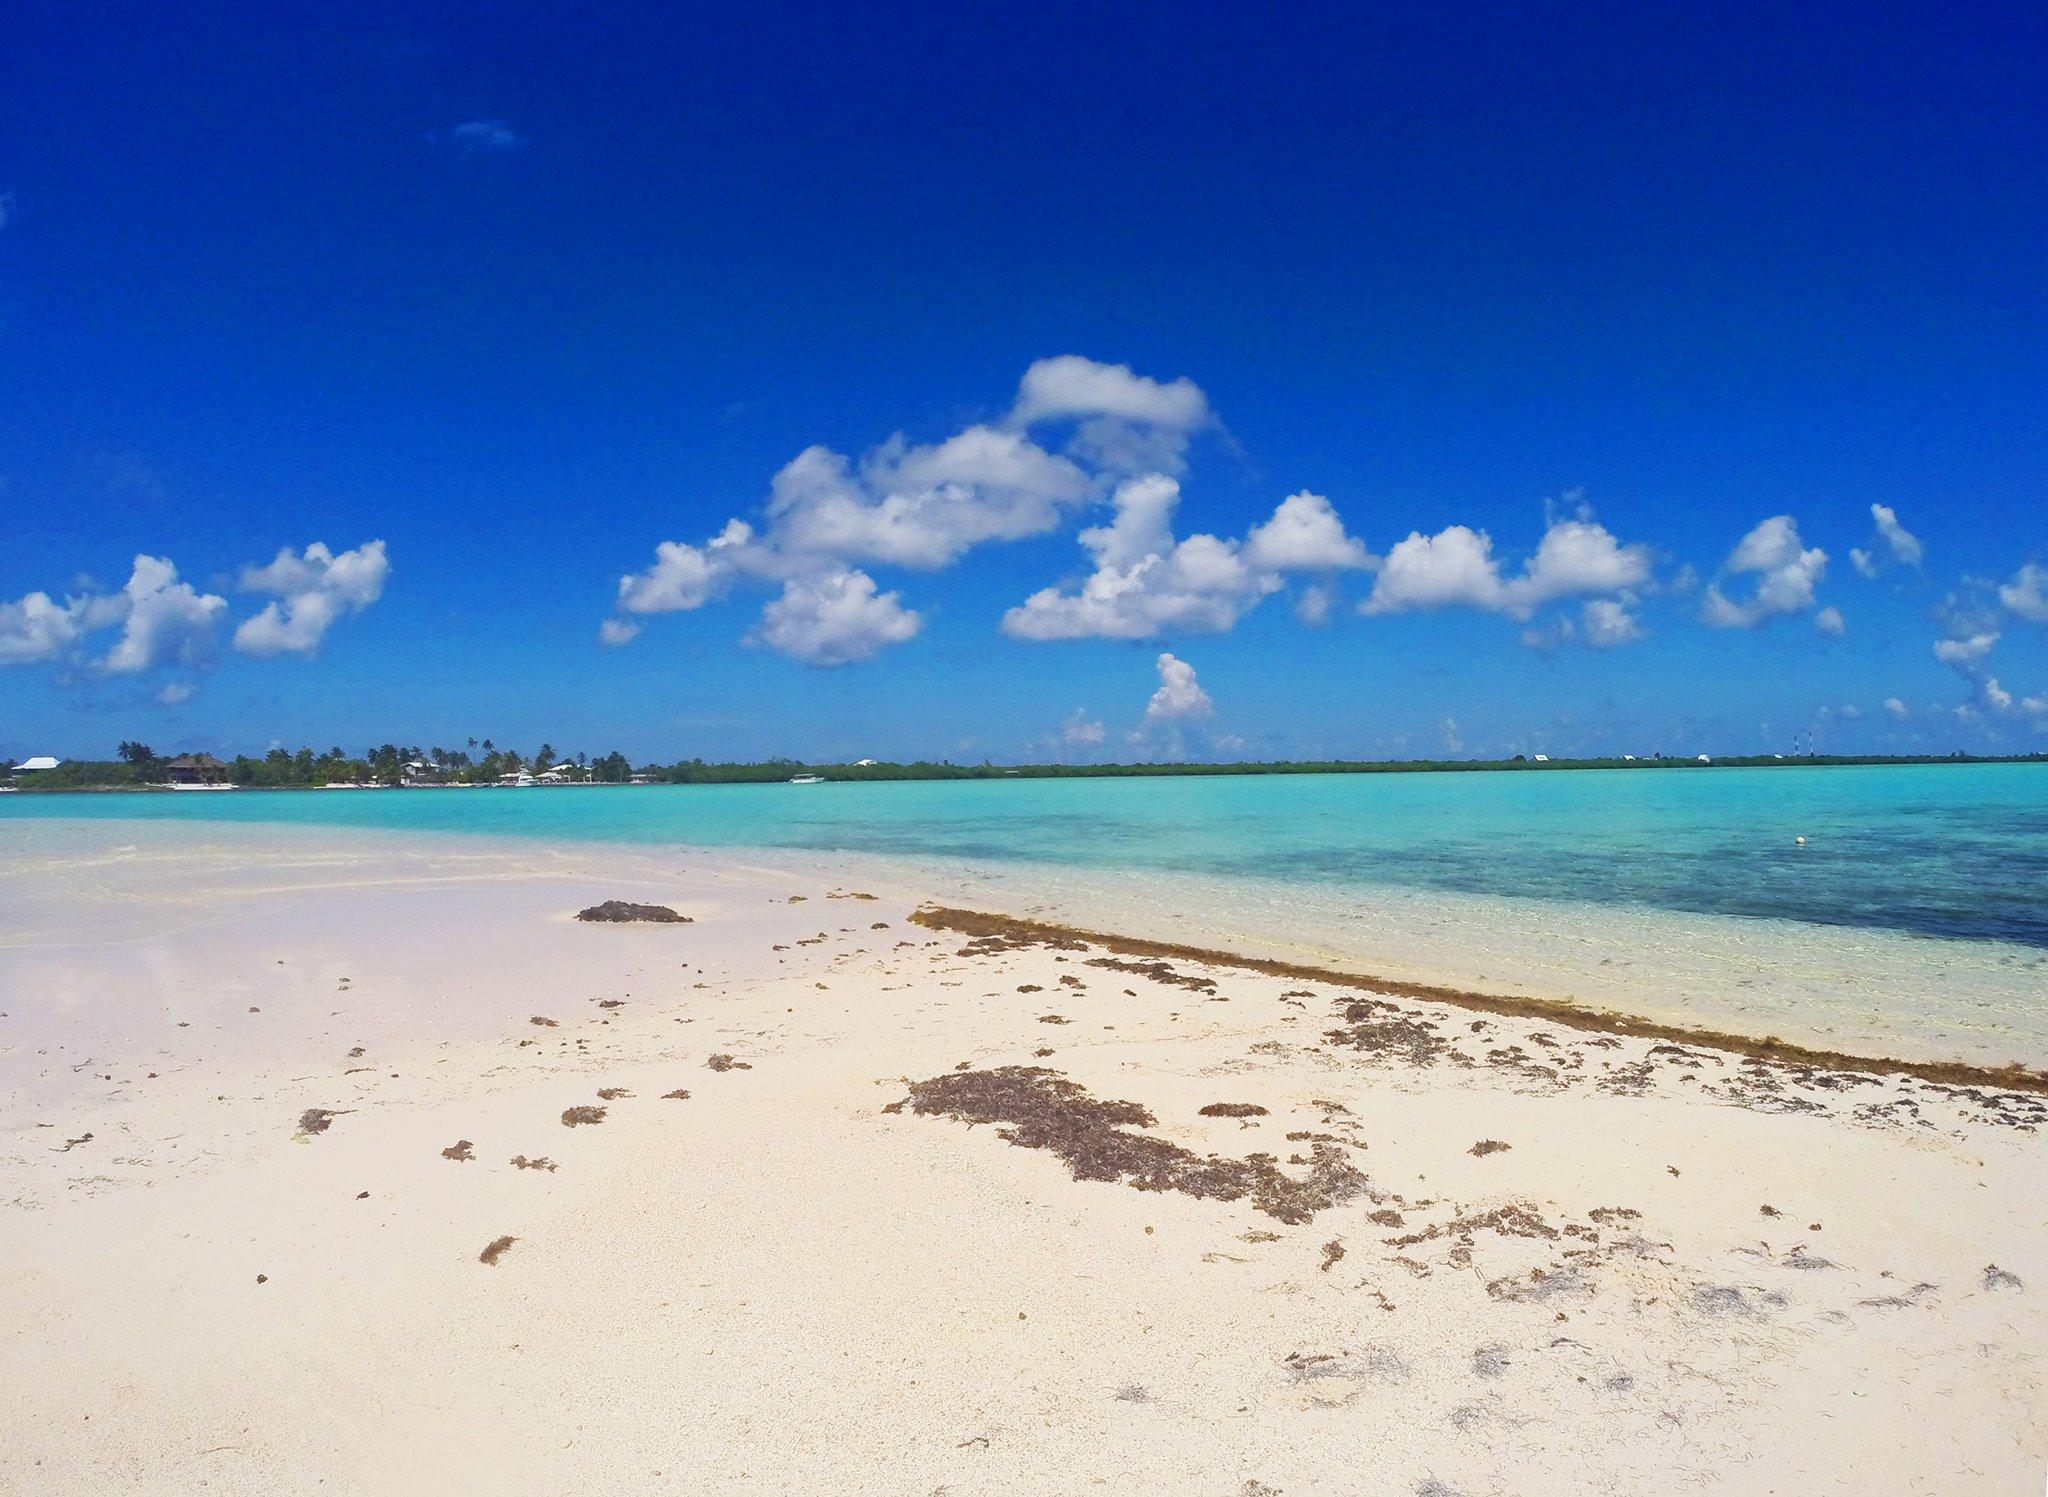 Owen Island Little Cayman